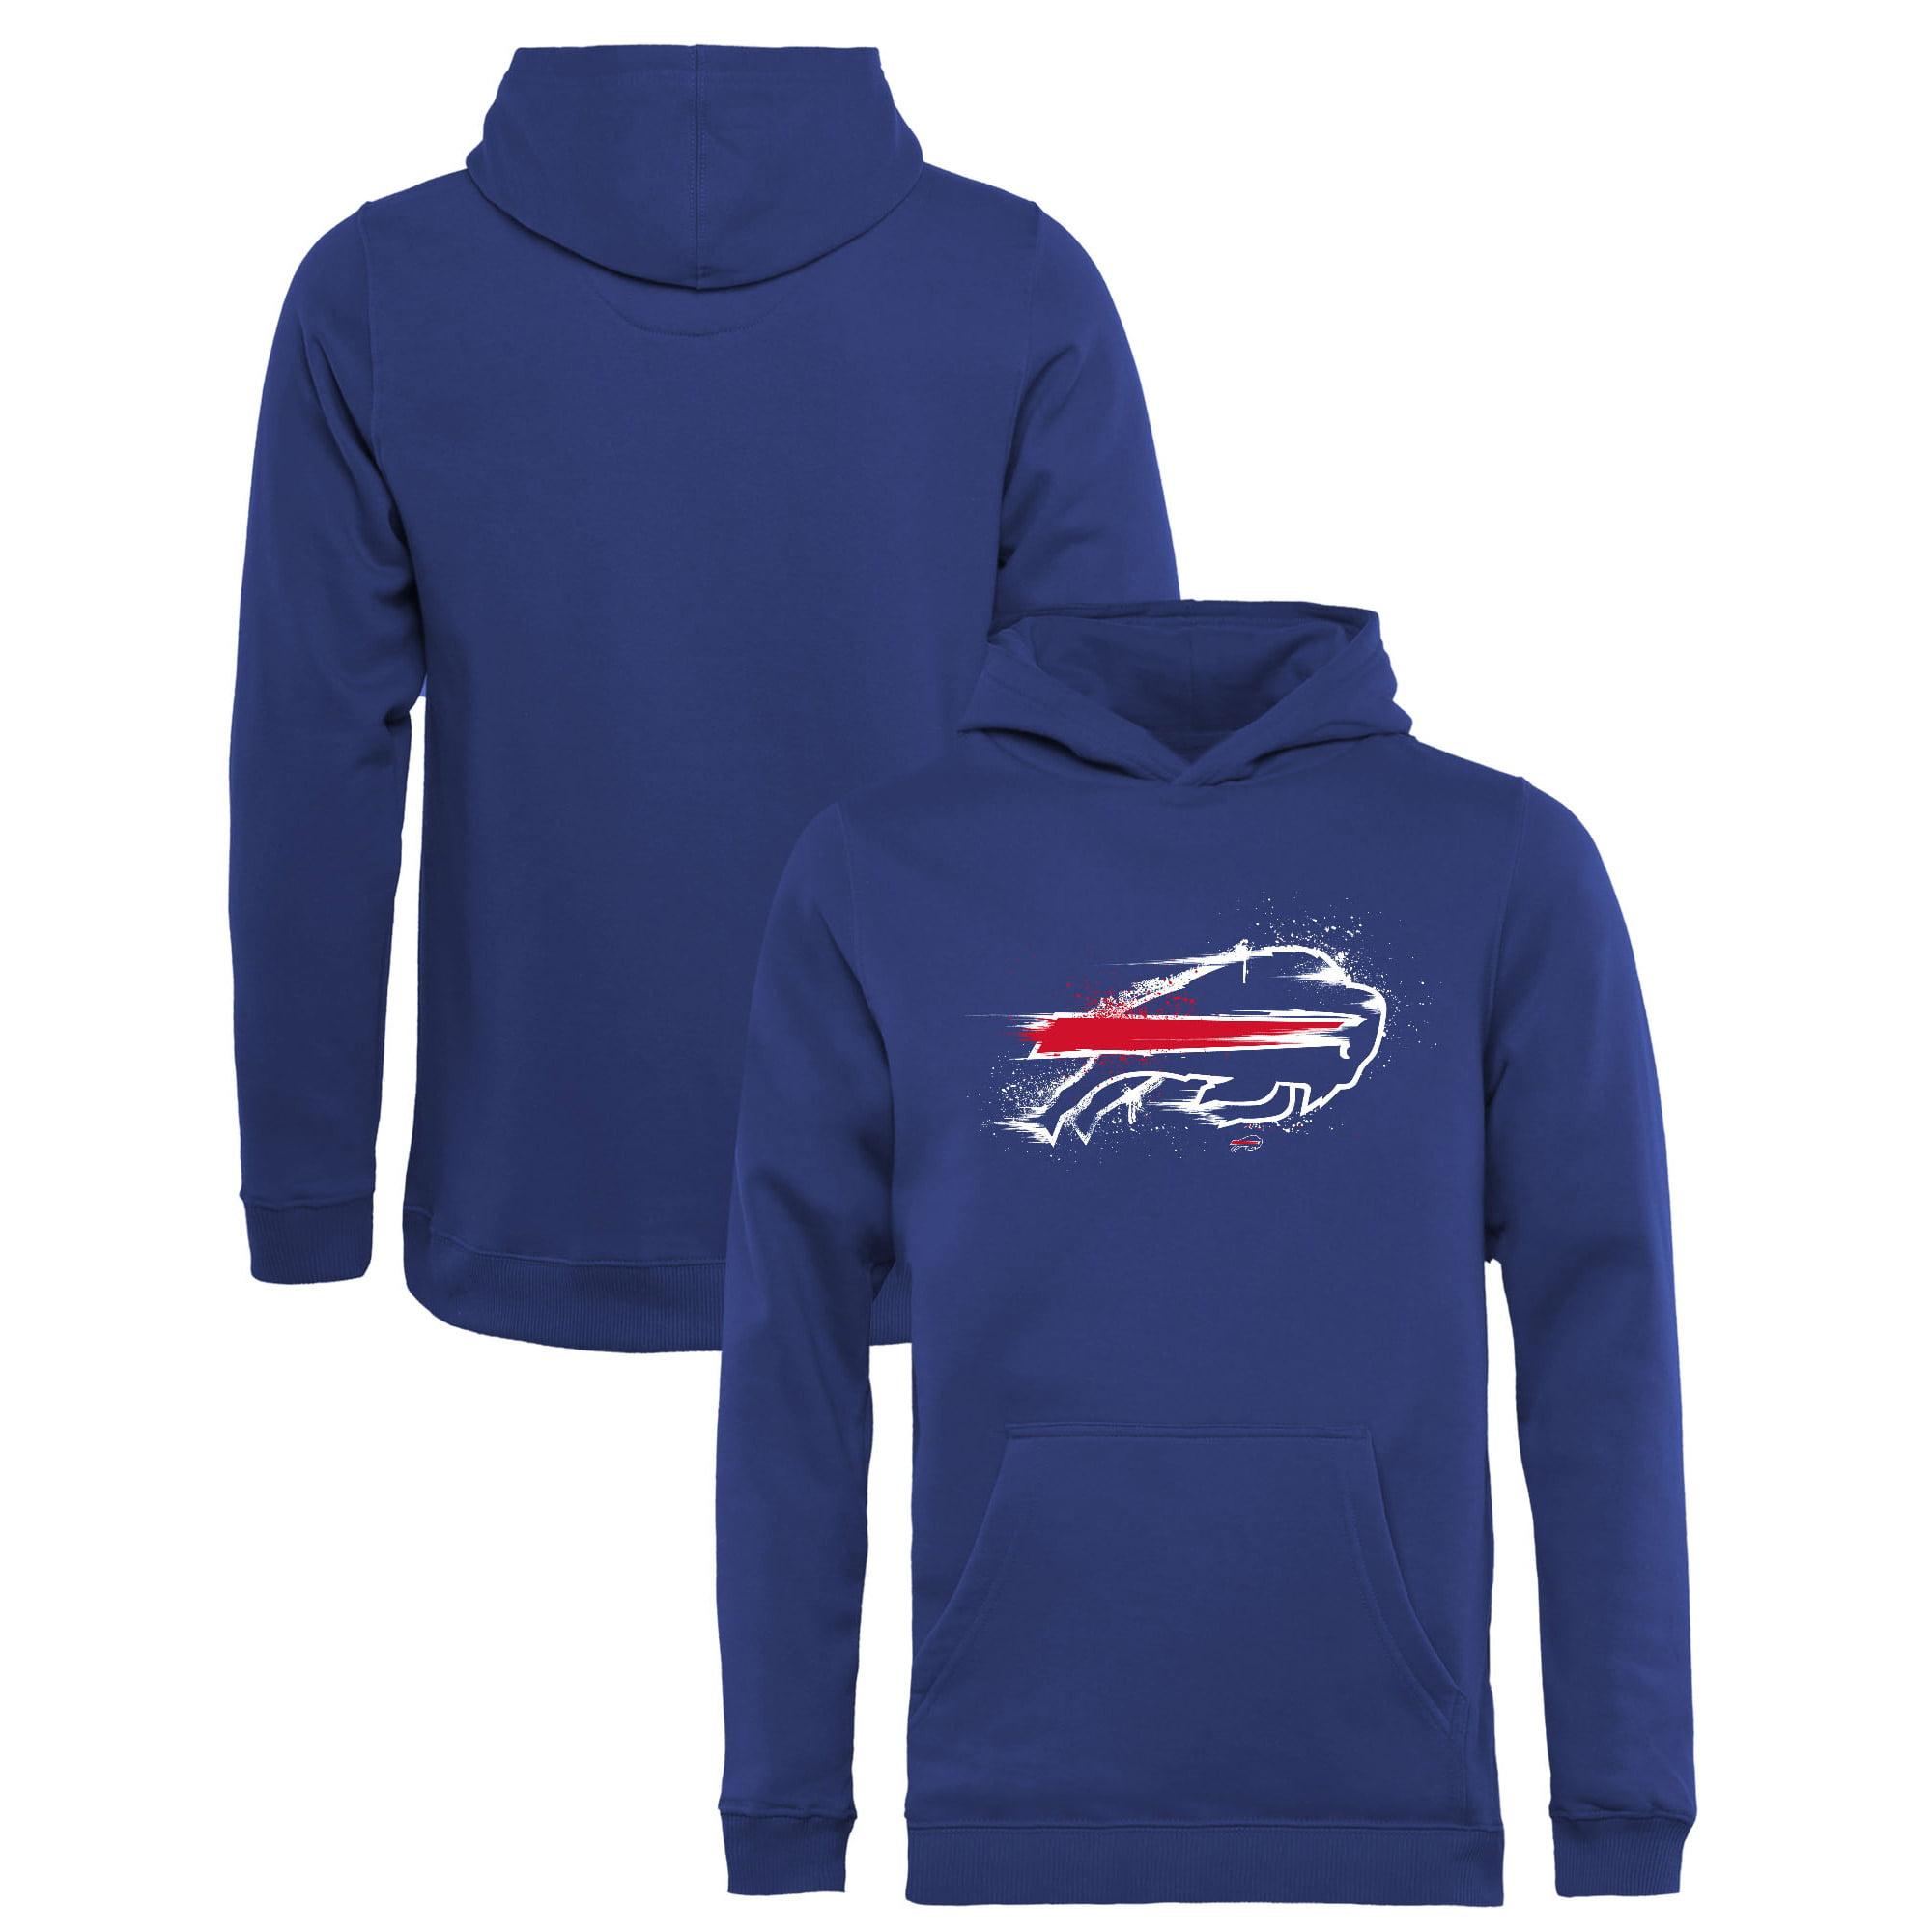 Buffalo Bills NFL Pro Line by Fanatics Branded Youth Splatter Logo Pullover Hoodie - Royal